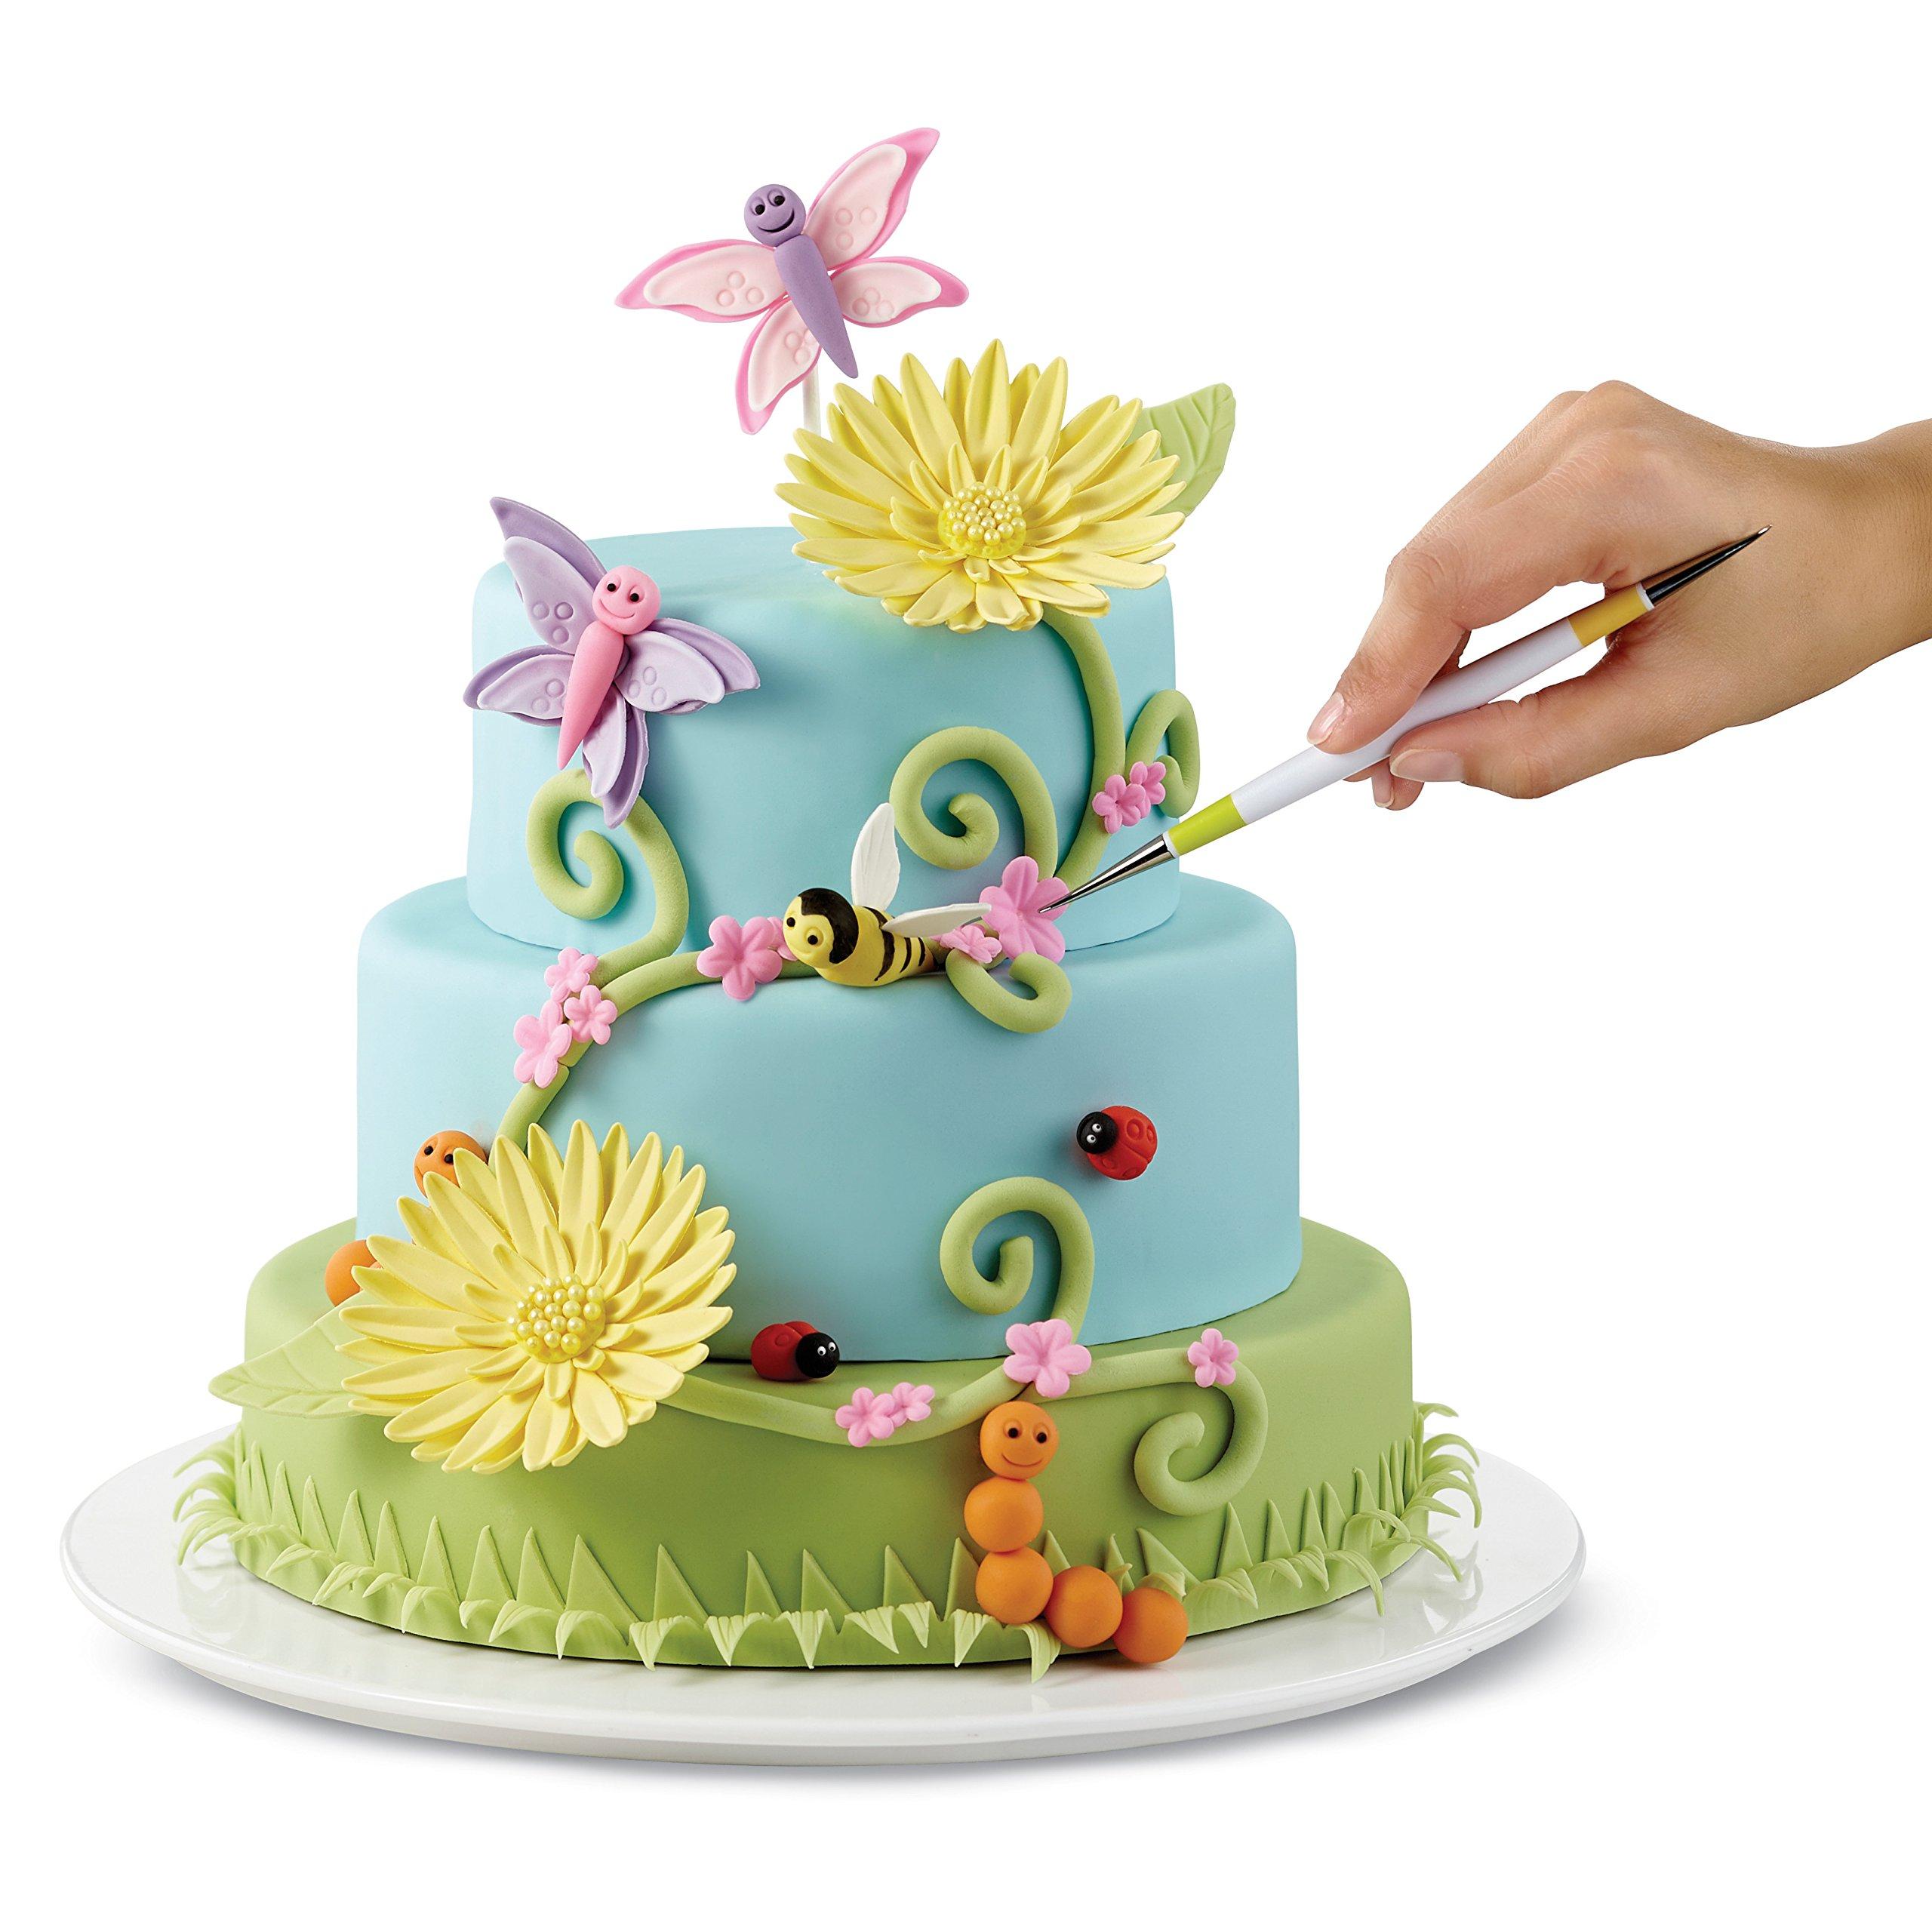 Wilton 3D Figure Modeling Fondant Tool Set, 8-Piece Cake Decorating Tool Set by Wilton (Image #17)